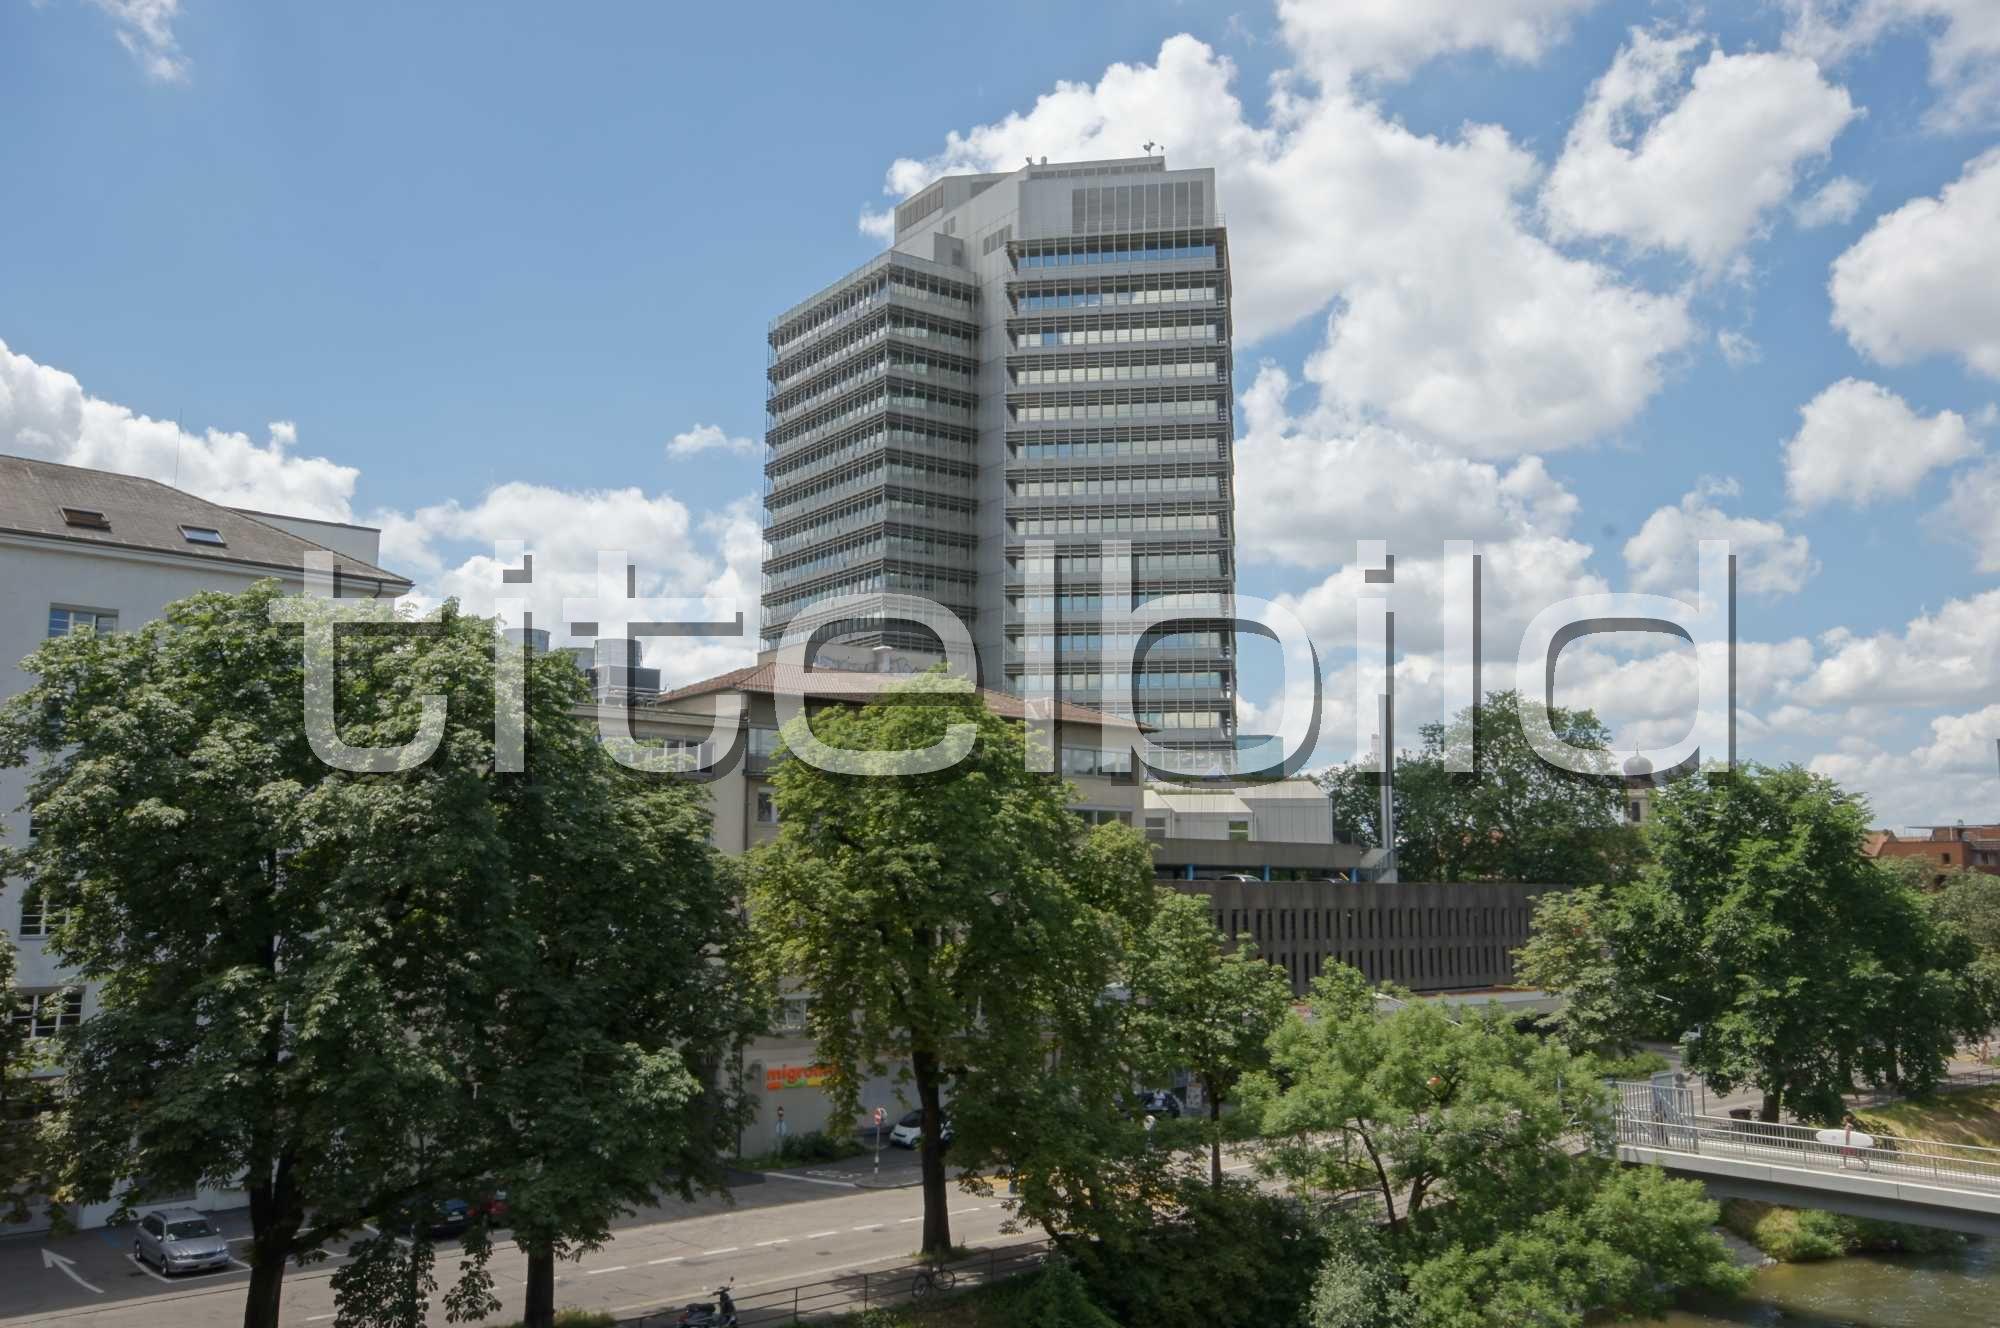 Projektbild-Nr. 2: Umbau/Sanierung Migros Hochhaus 4